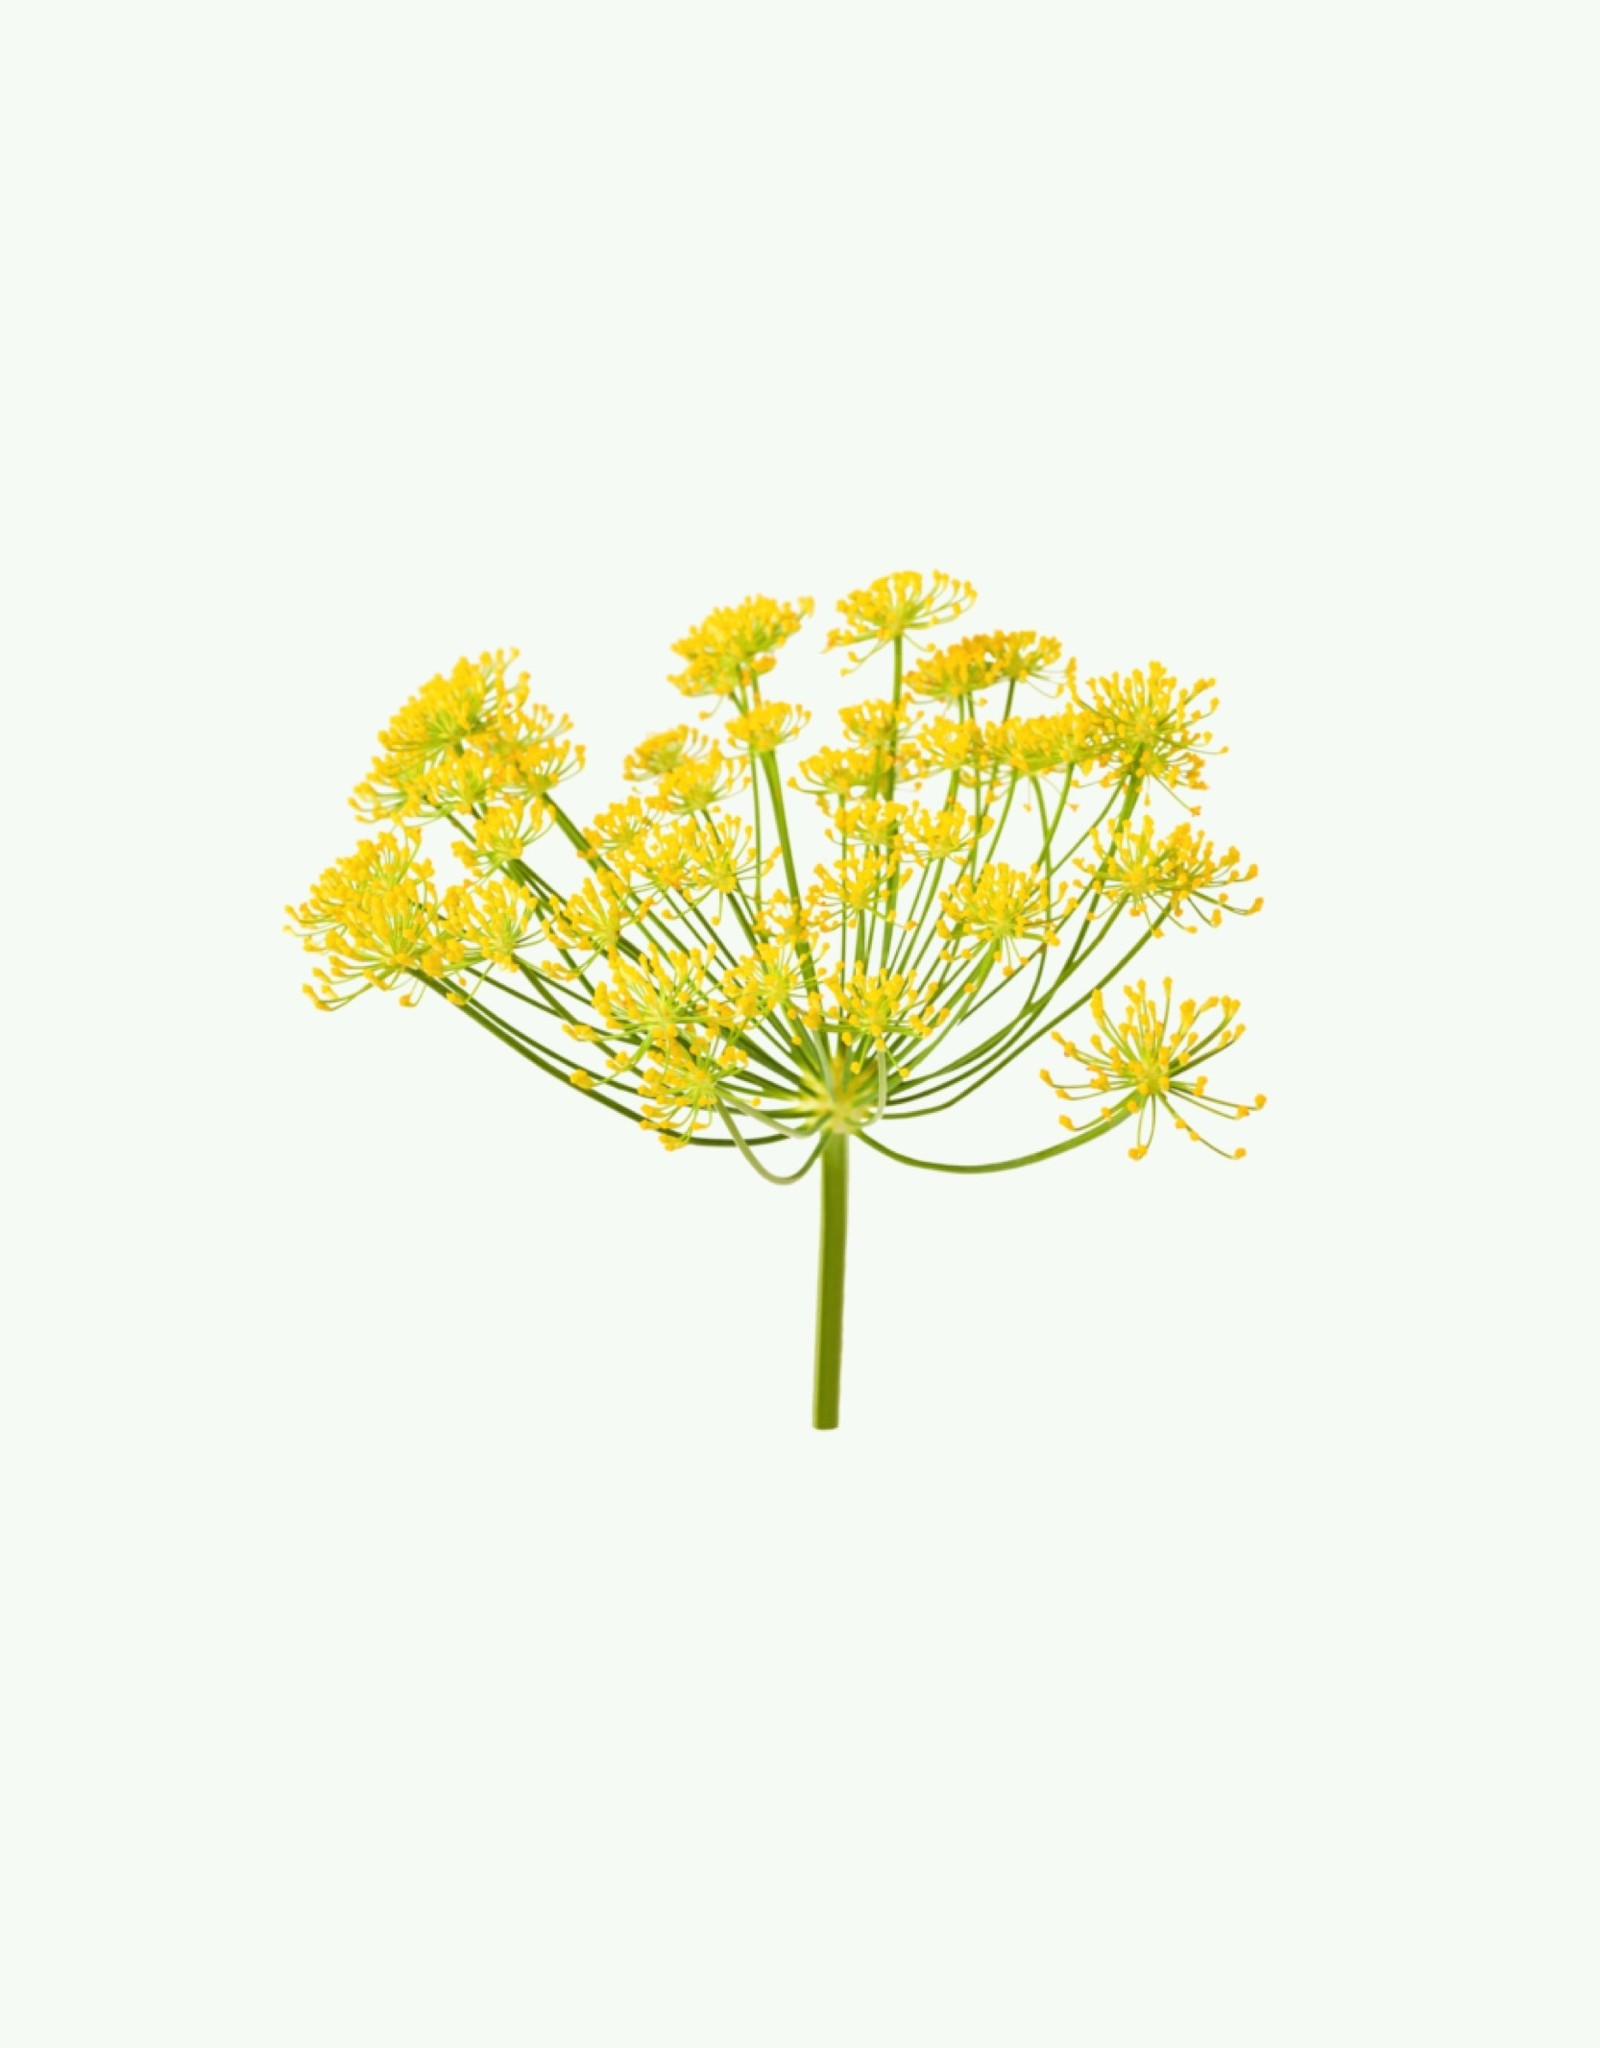 Haeckels Haeckels - Wild Fennel - Incense Cones